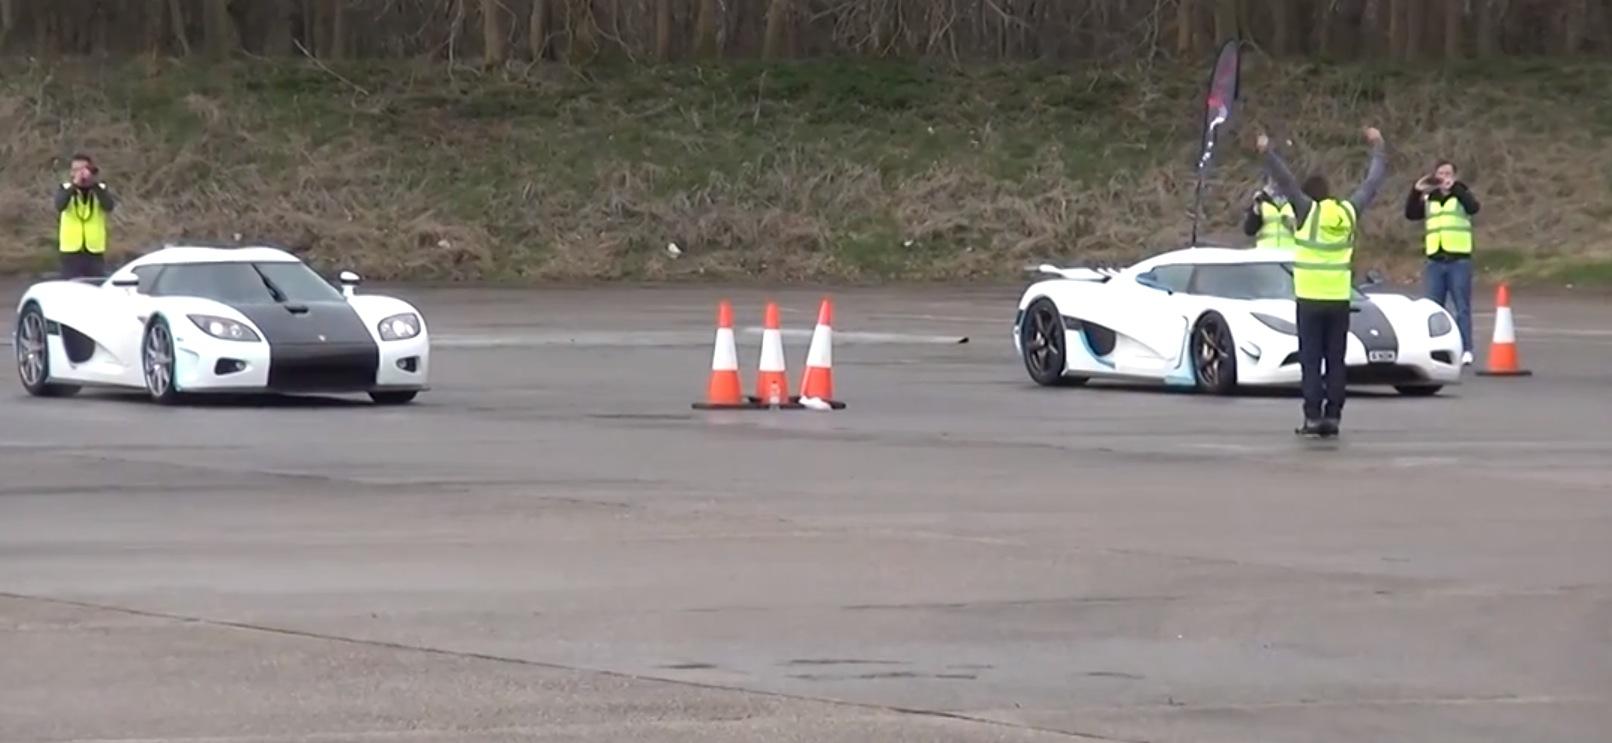 Koenigsegg Agera N Races Koenigsegg Ccx Shows How The Company